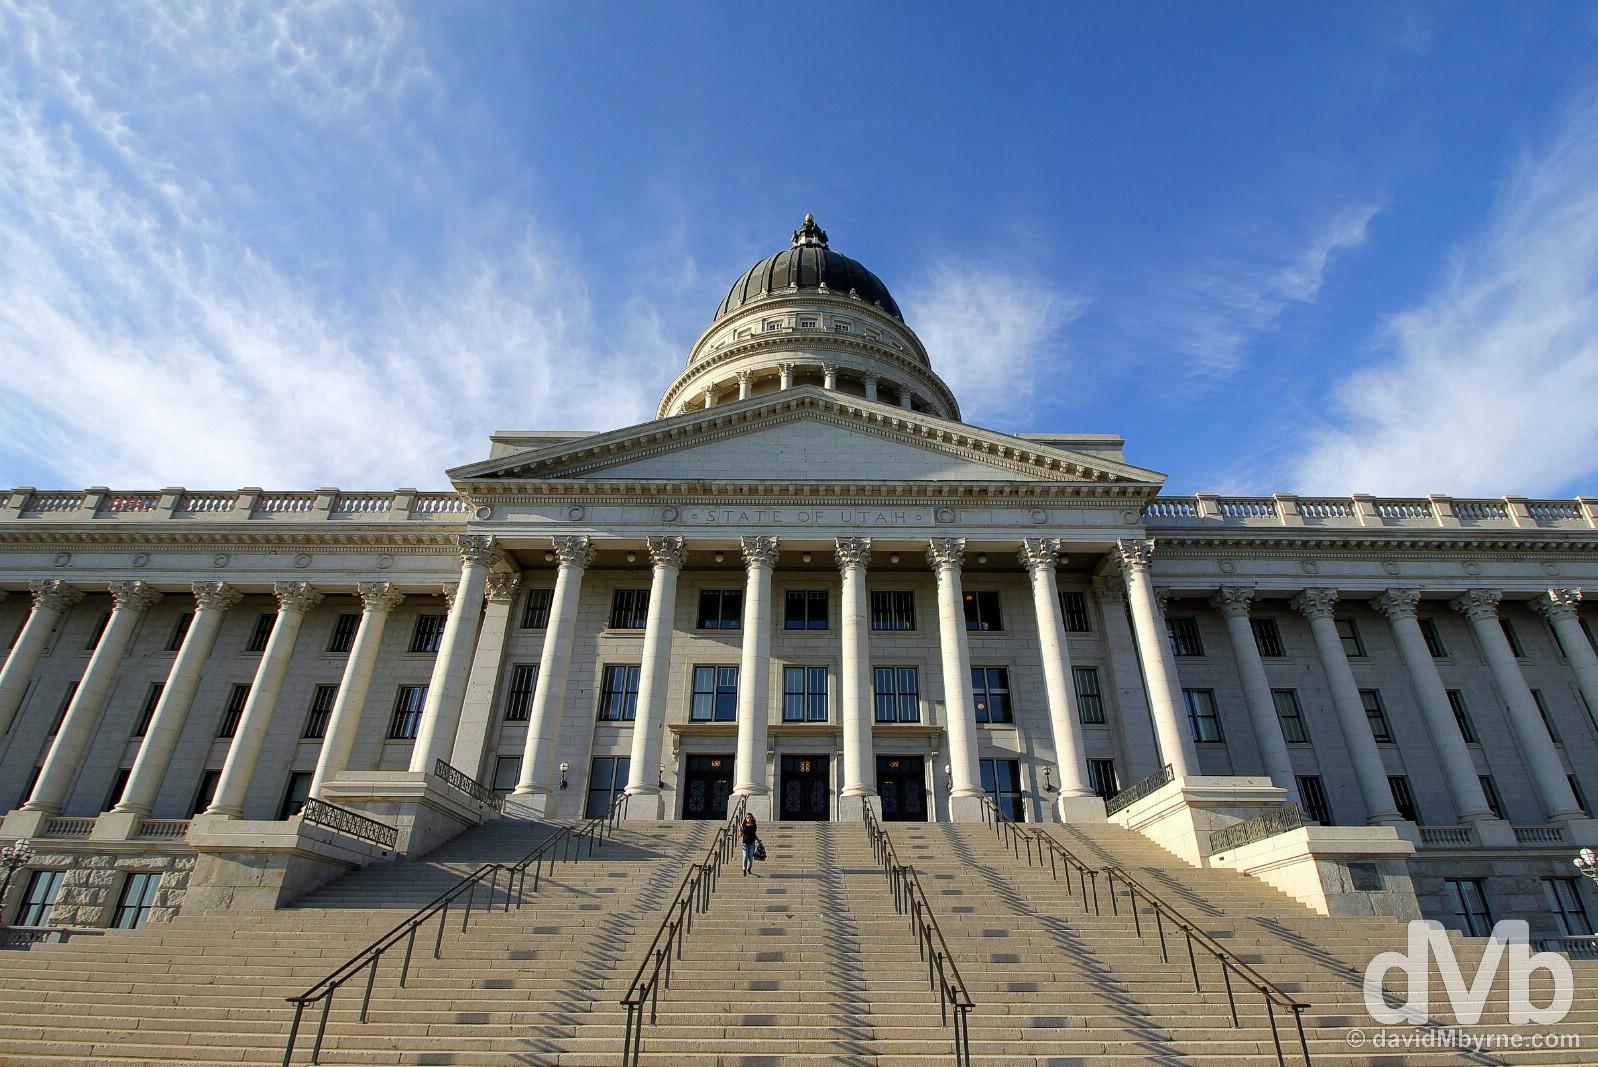 On the steps of the impressive State Capitol Building in Salt Lake City, Utah. September 6, 2016.